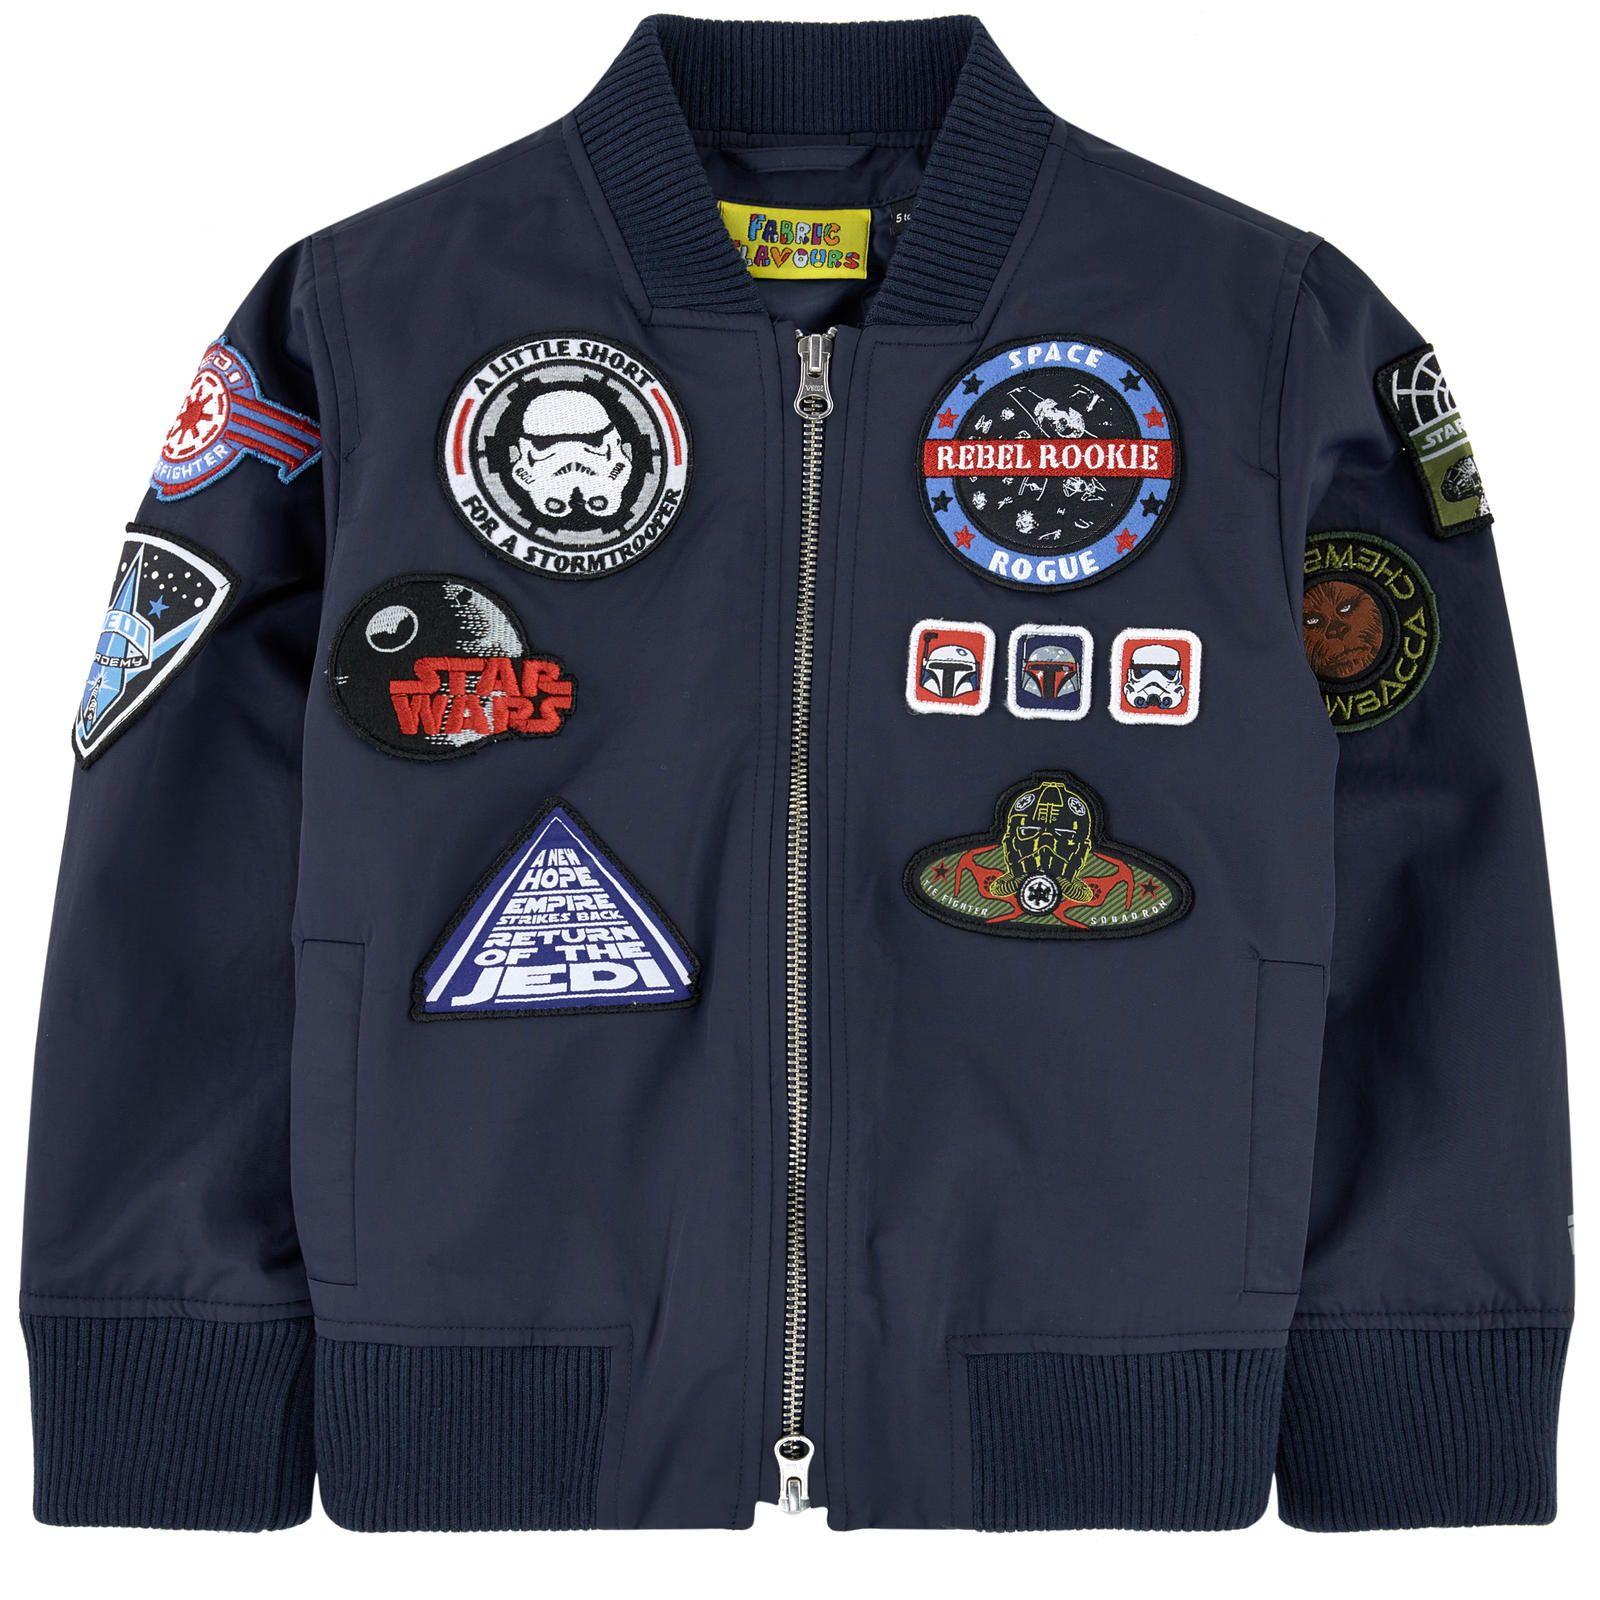 Star Wars Reflective Bomber Jacket Bomber Jacket Varsity Jacket Men Clothes Design